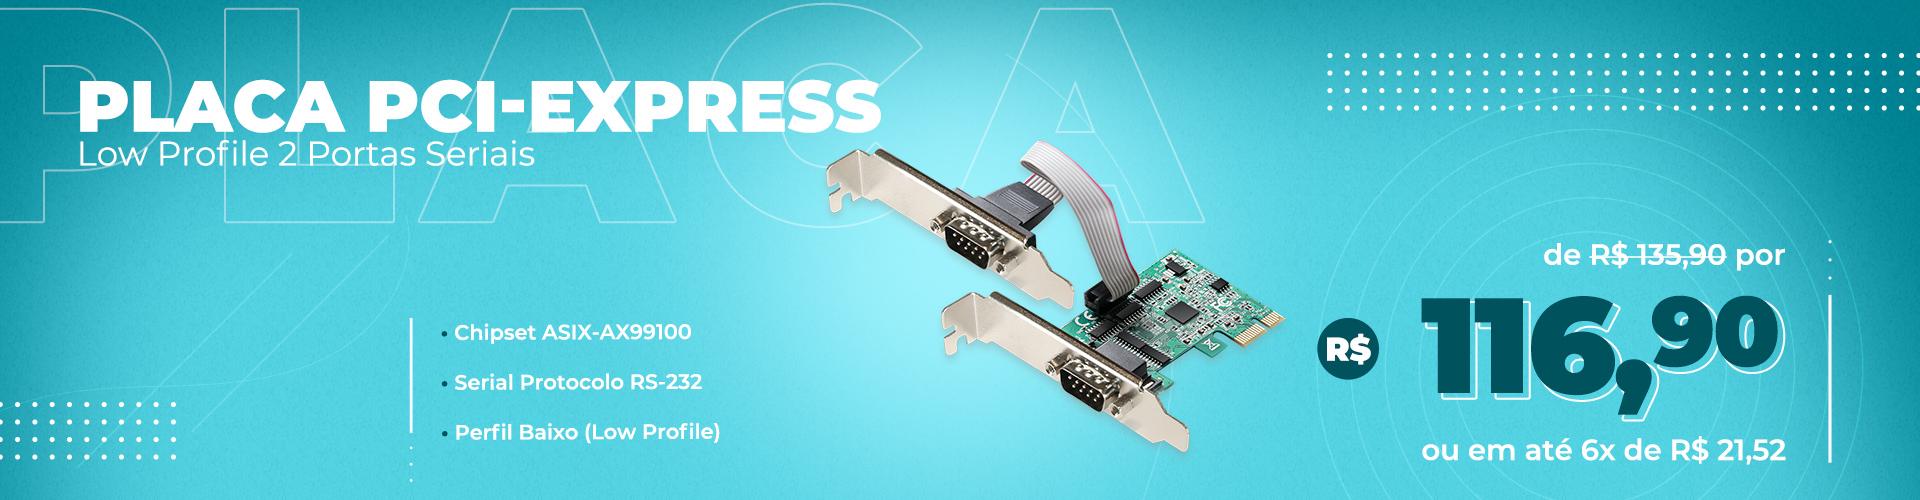 Placa PCI-Express Low Profile